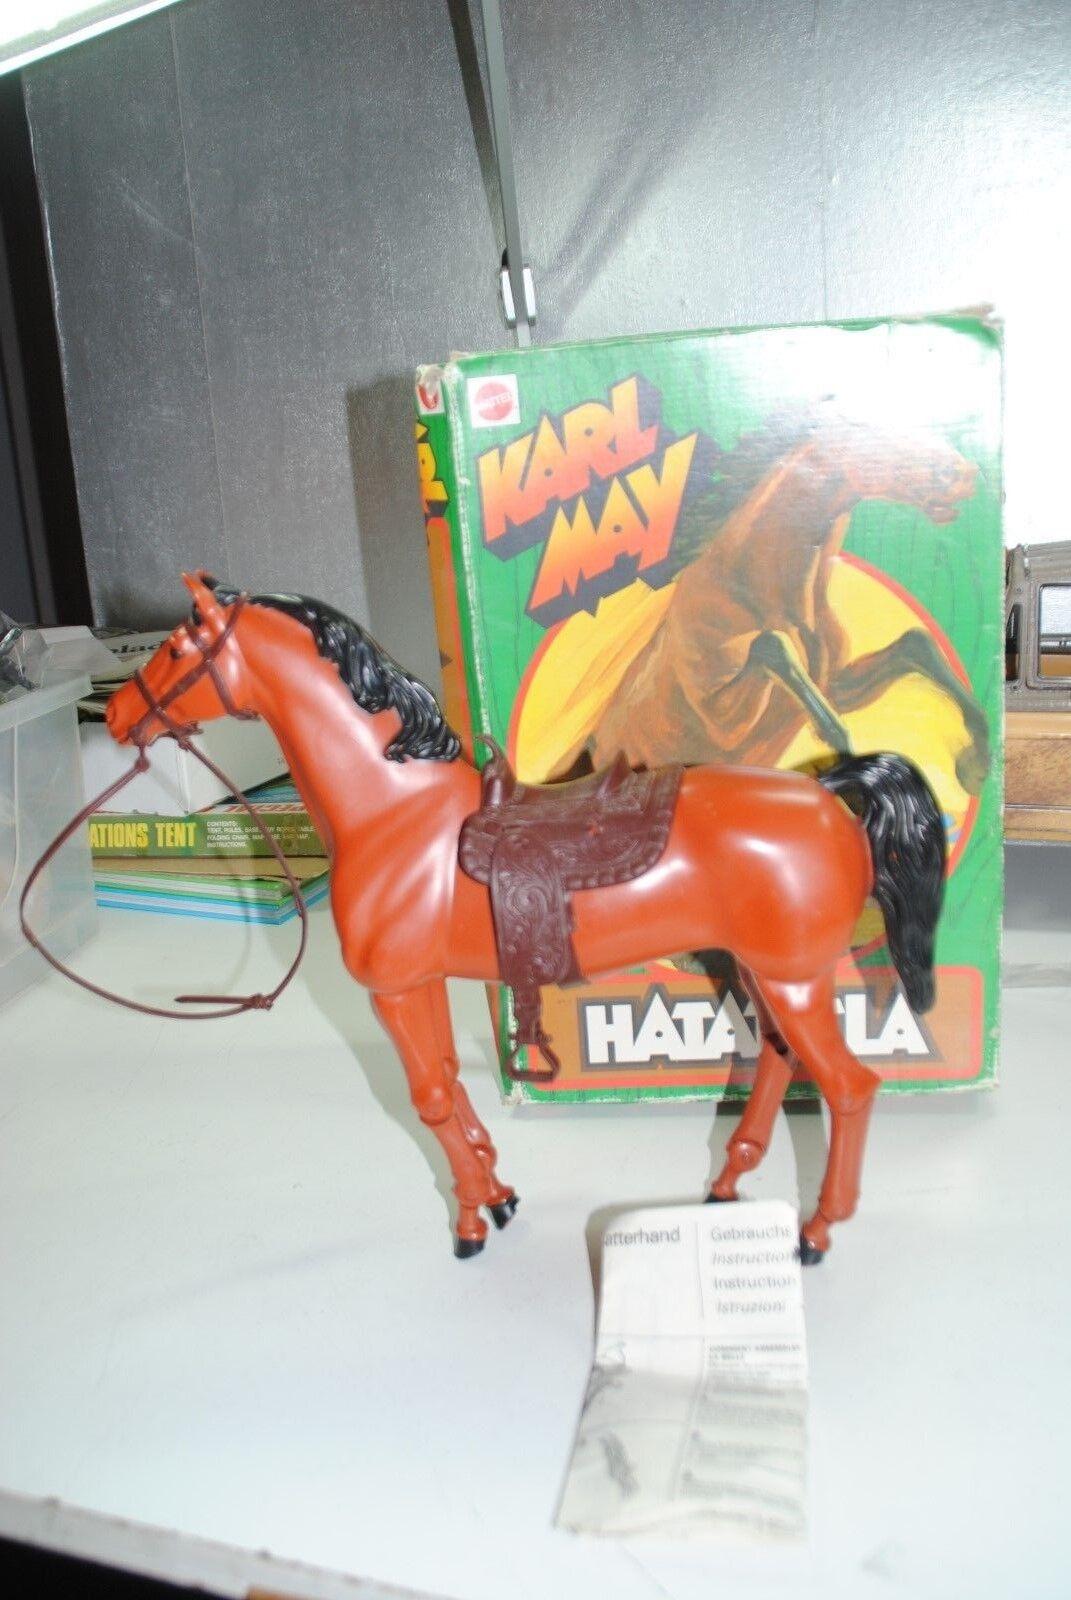 Big jim, karl may  hatatitla  pferd umzingelt